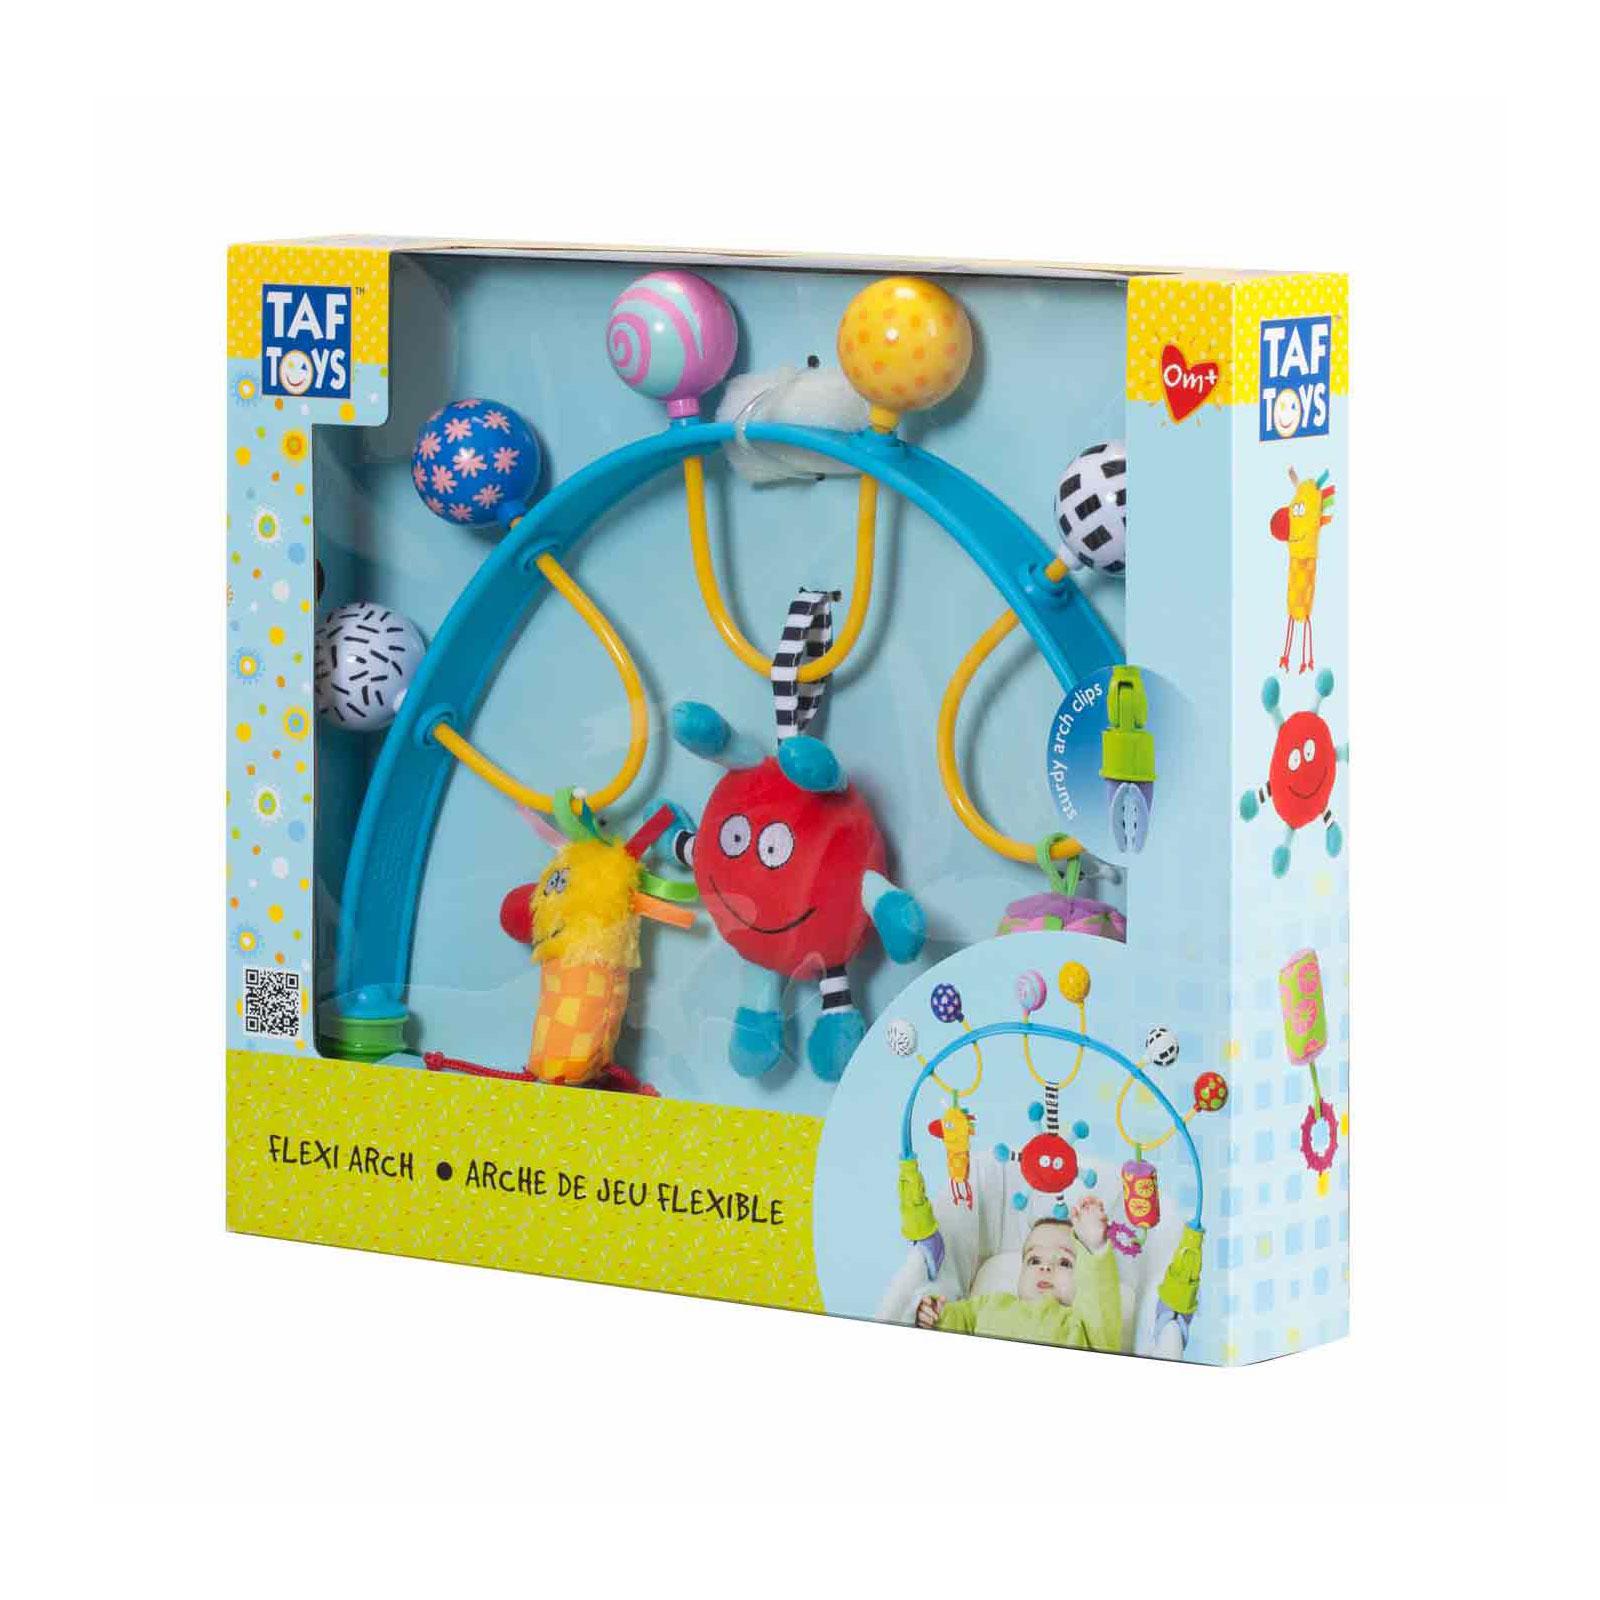 ���� ����������� Taf Toys ������ � 0 ���.